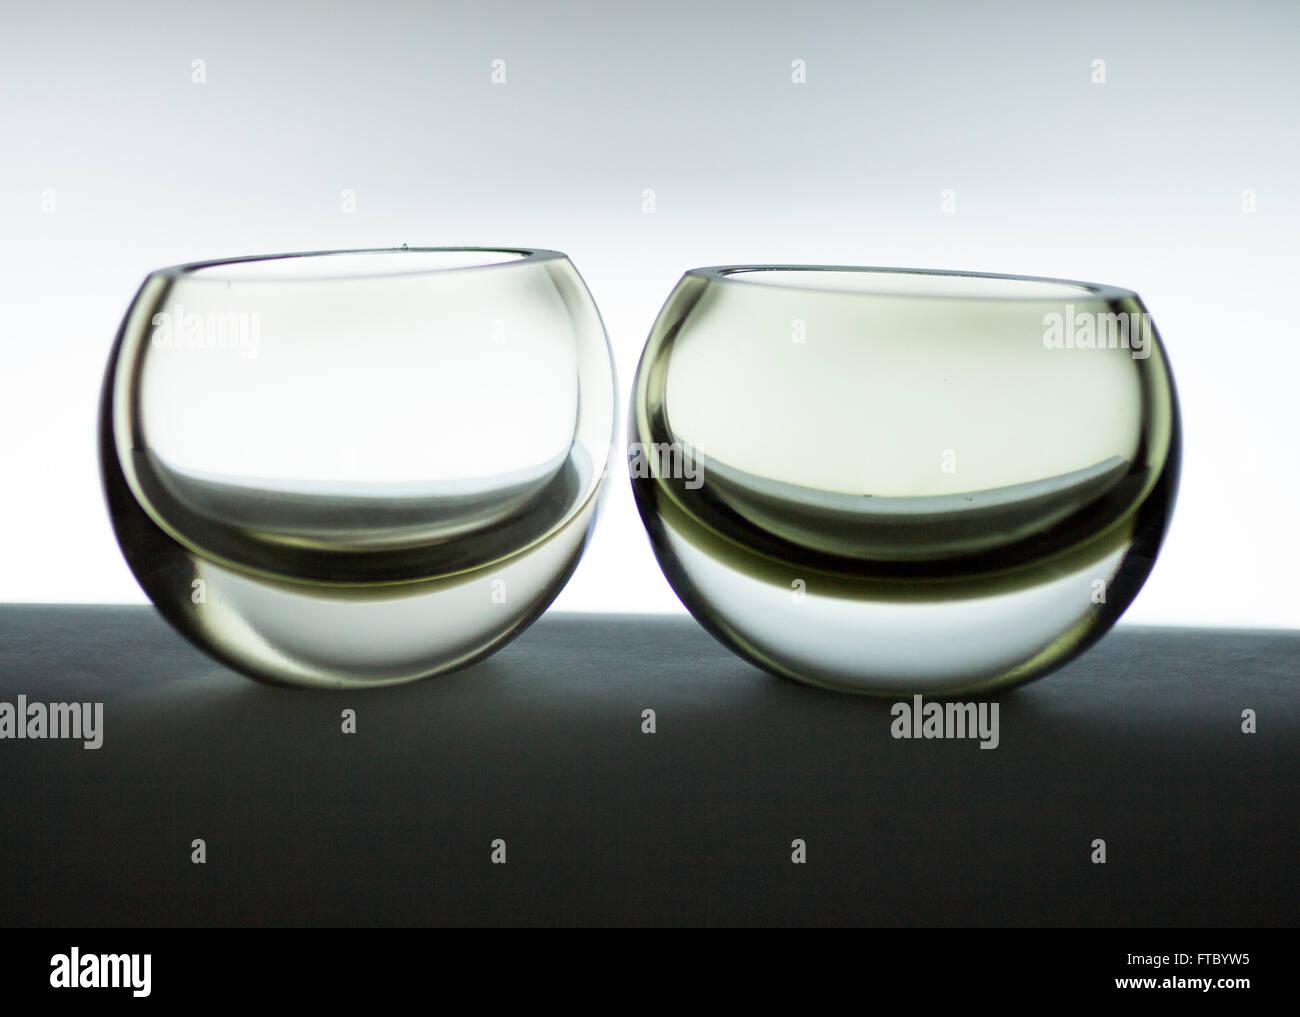 Two Tapio Wirkkala sommerso glass vases - Stock Image